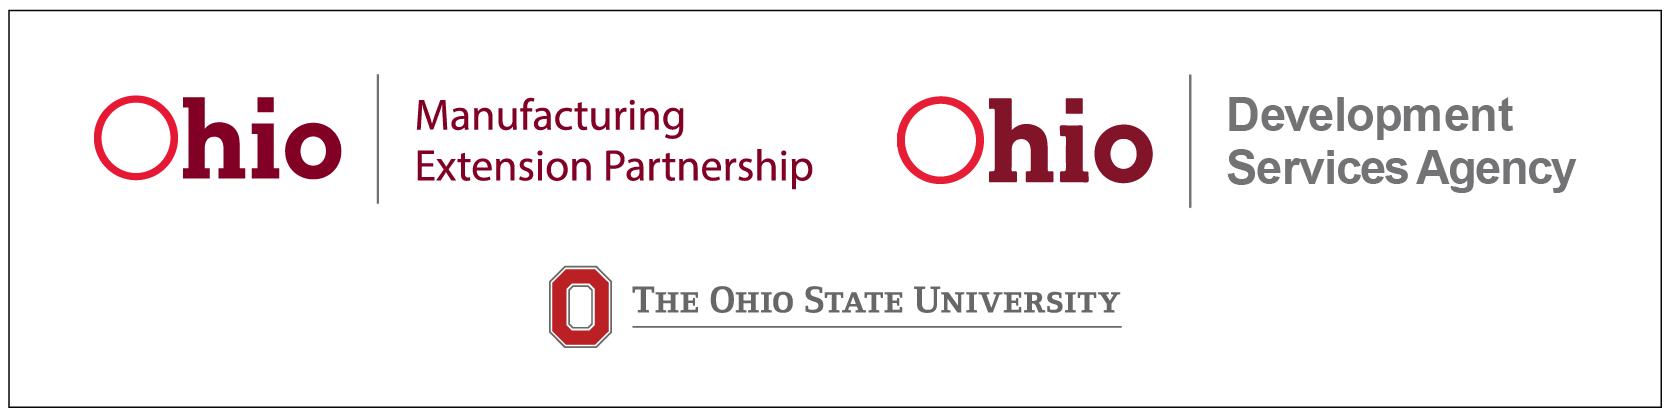 MEP Ohio Ohio Development Service Agency Ohio State CDME logos